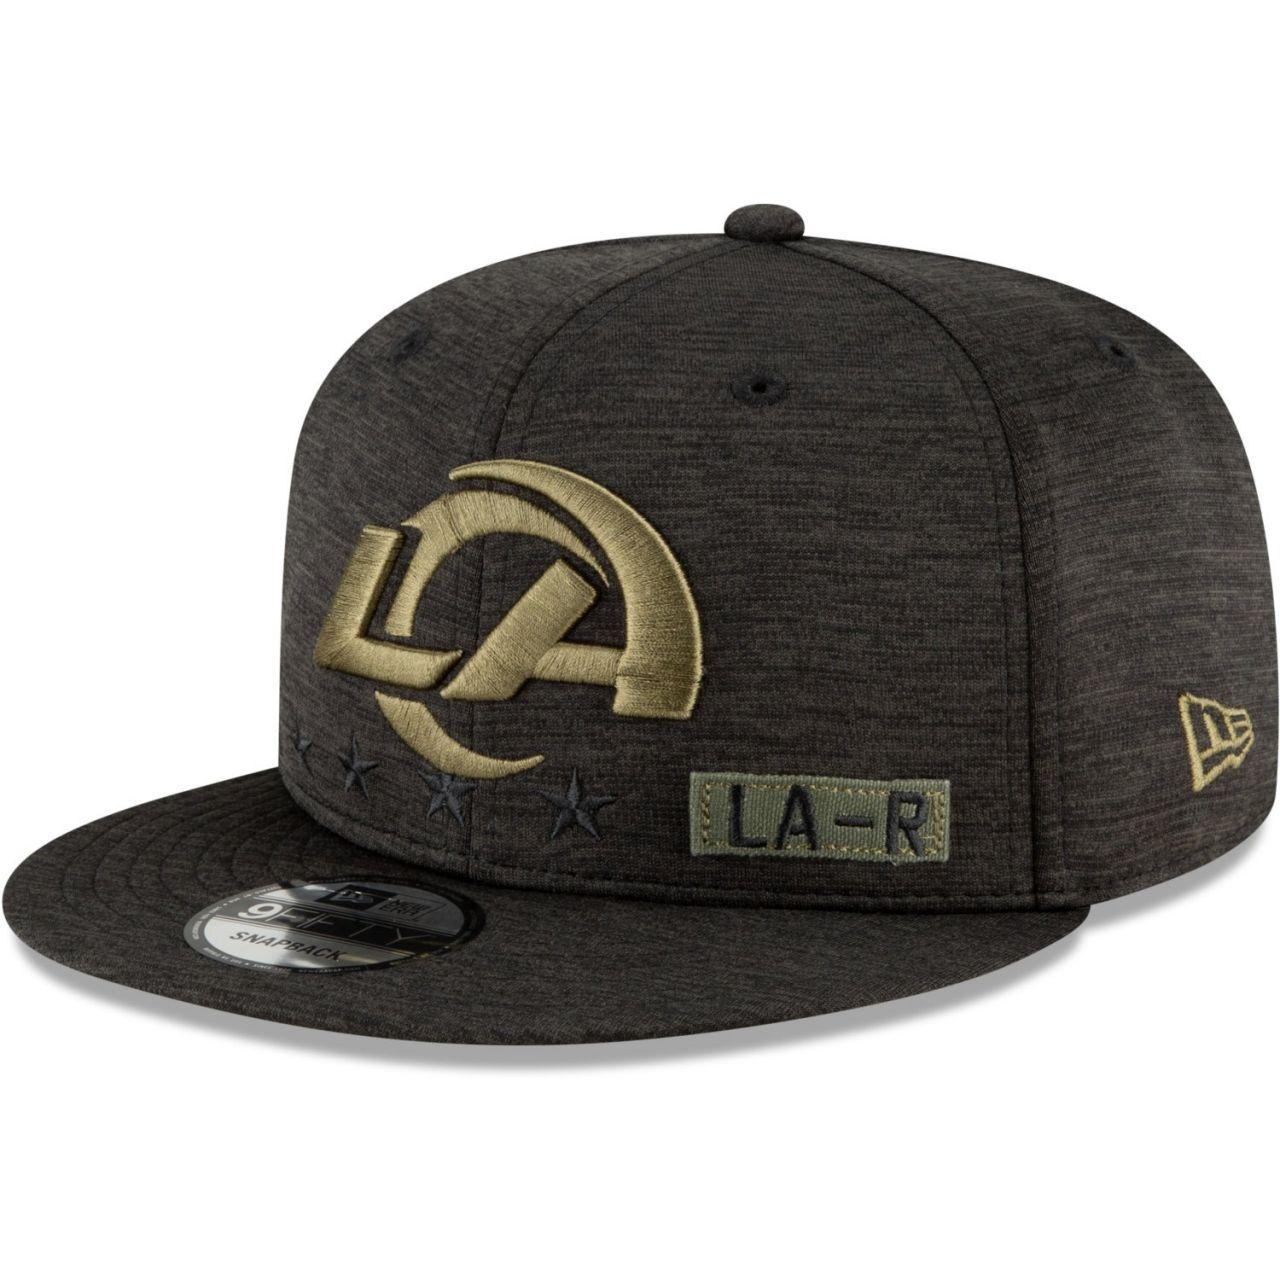 amfoo - New Era 9FIFTY Cap Salute to Service Los Angeles Rams